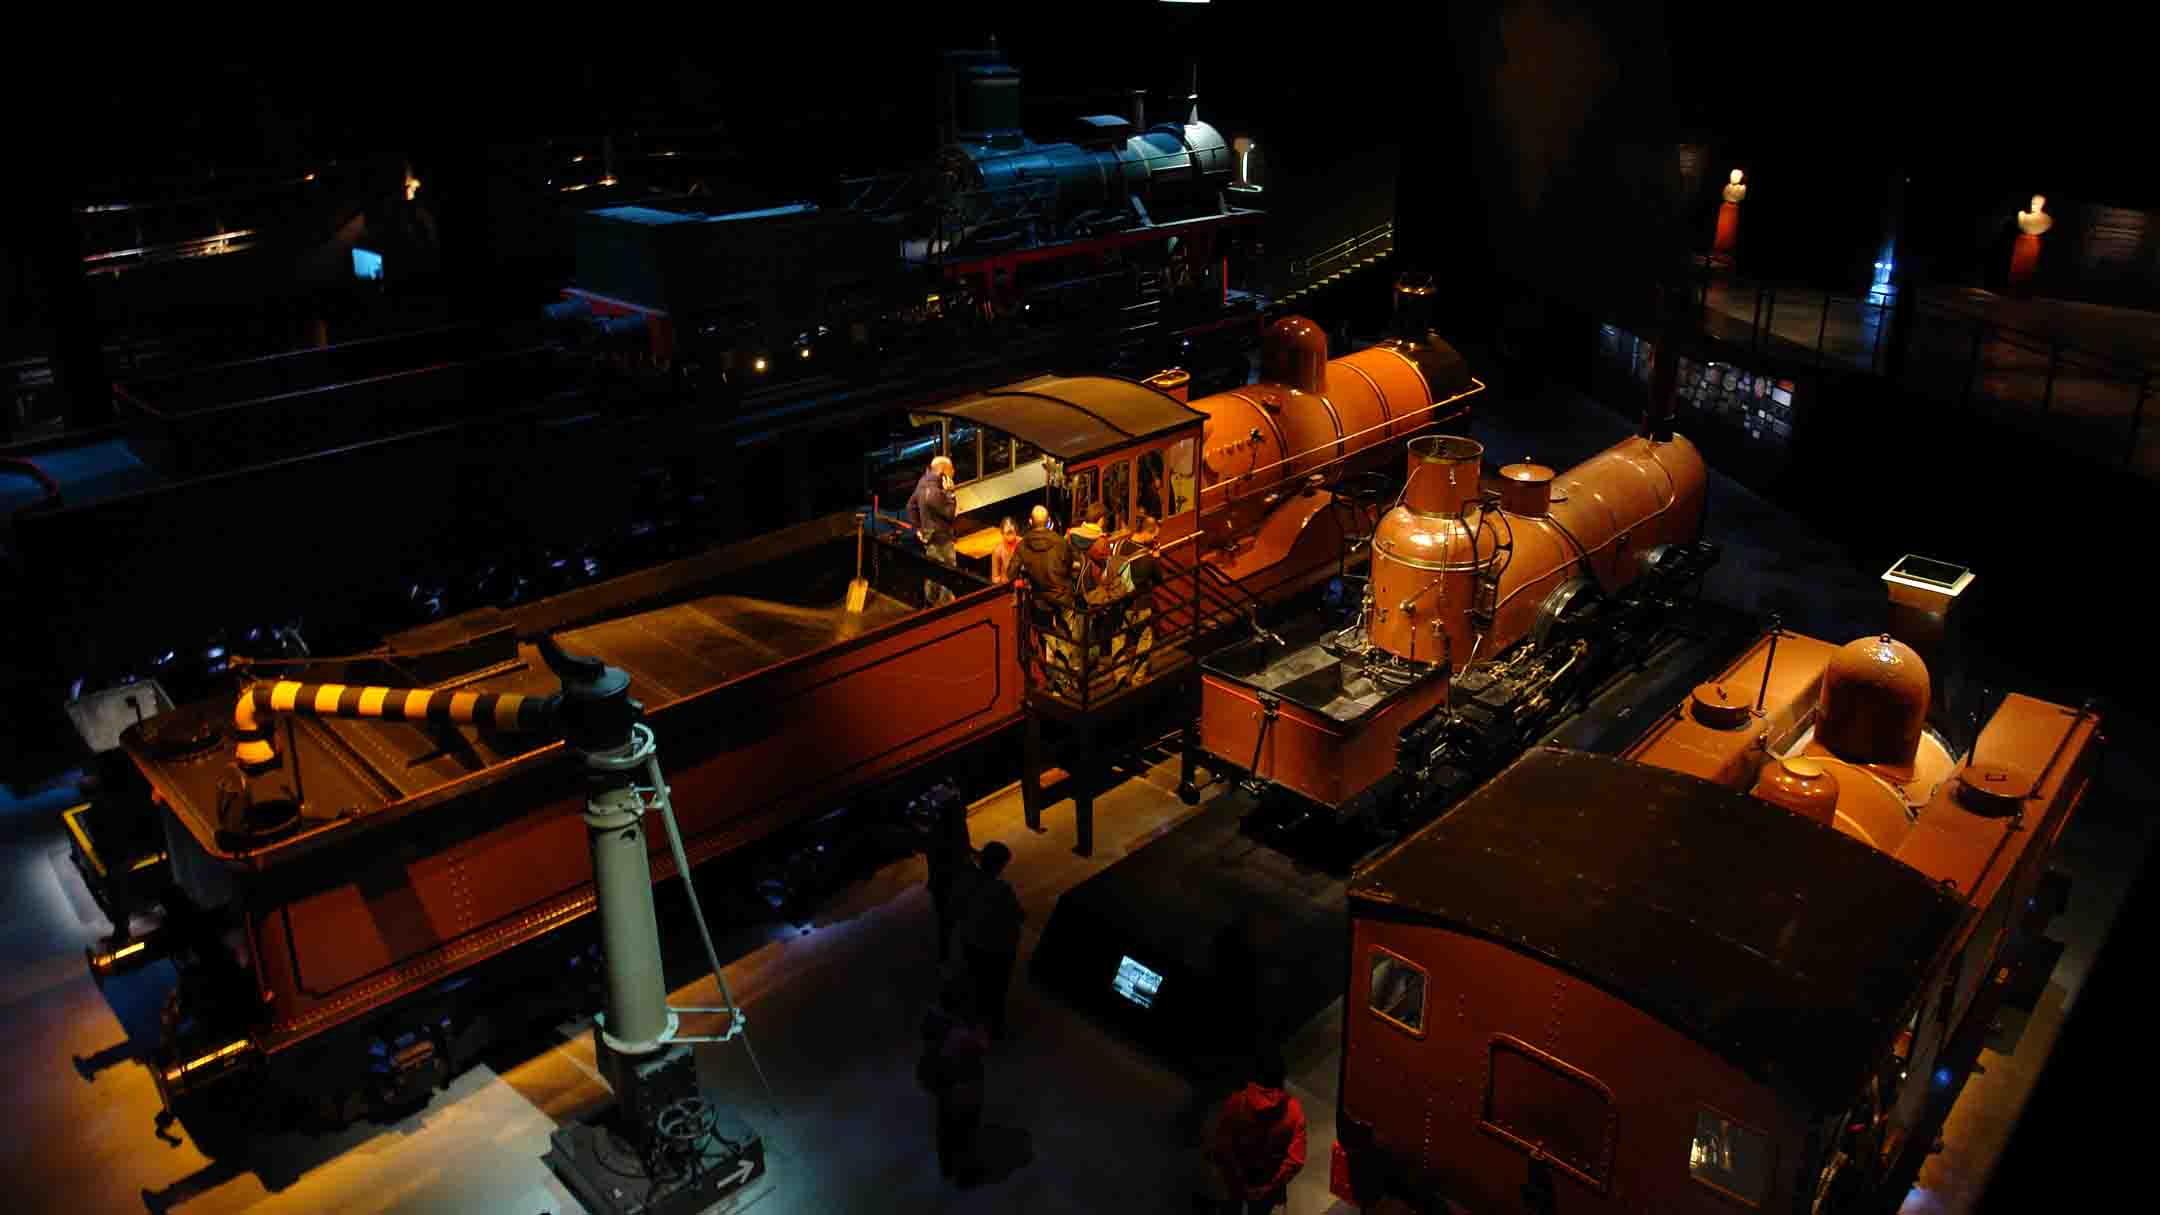 Train_World-_railway_museum_in_Brussels_01